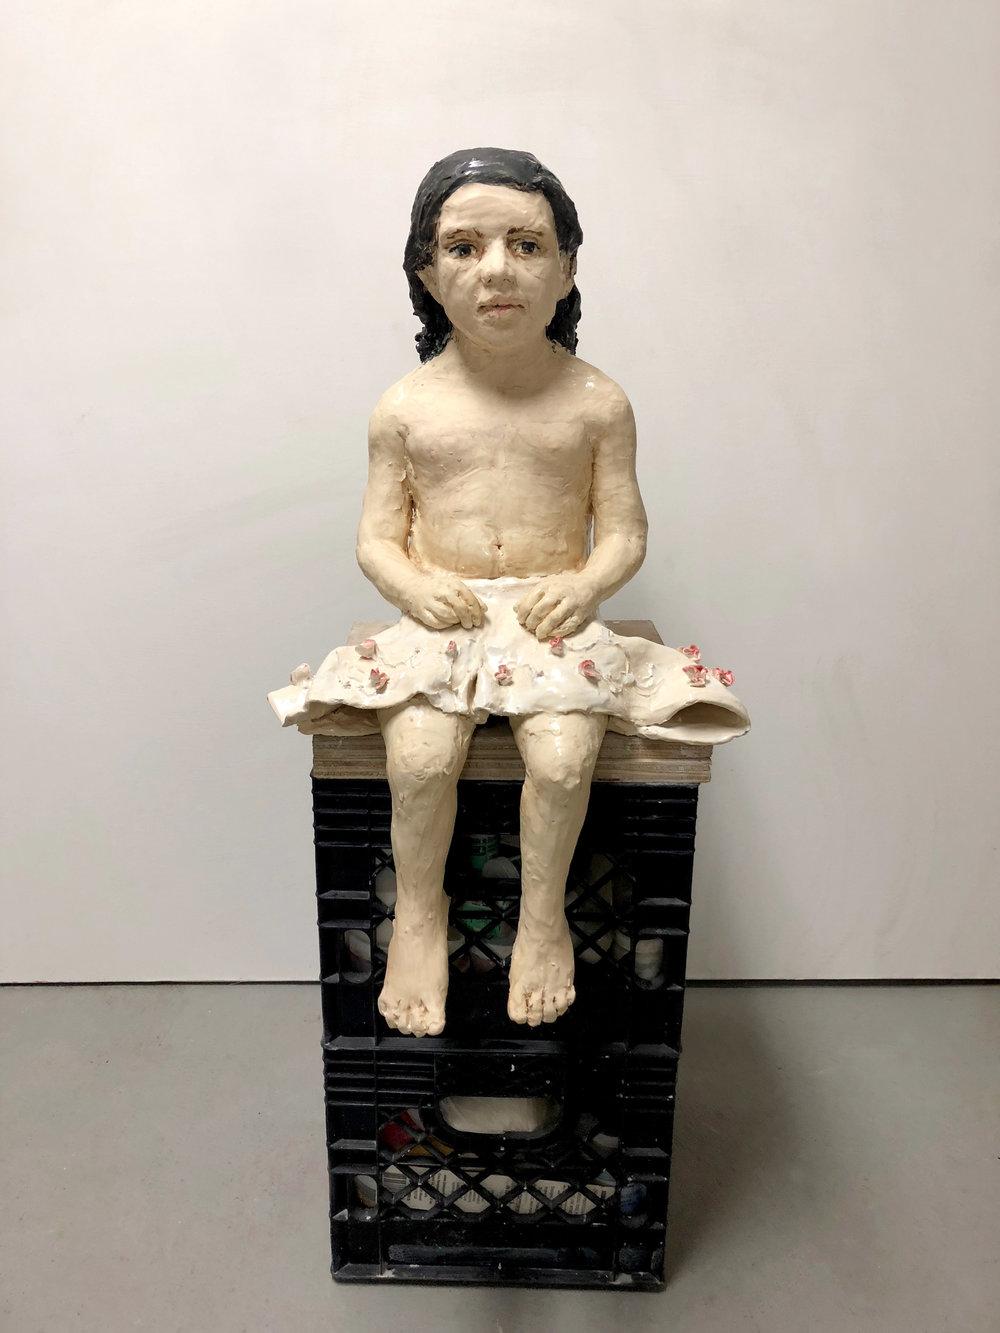 Girl with Skirt,  2018, glazed ceramic, 29 X 16 X 11 inches